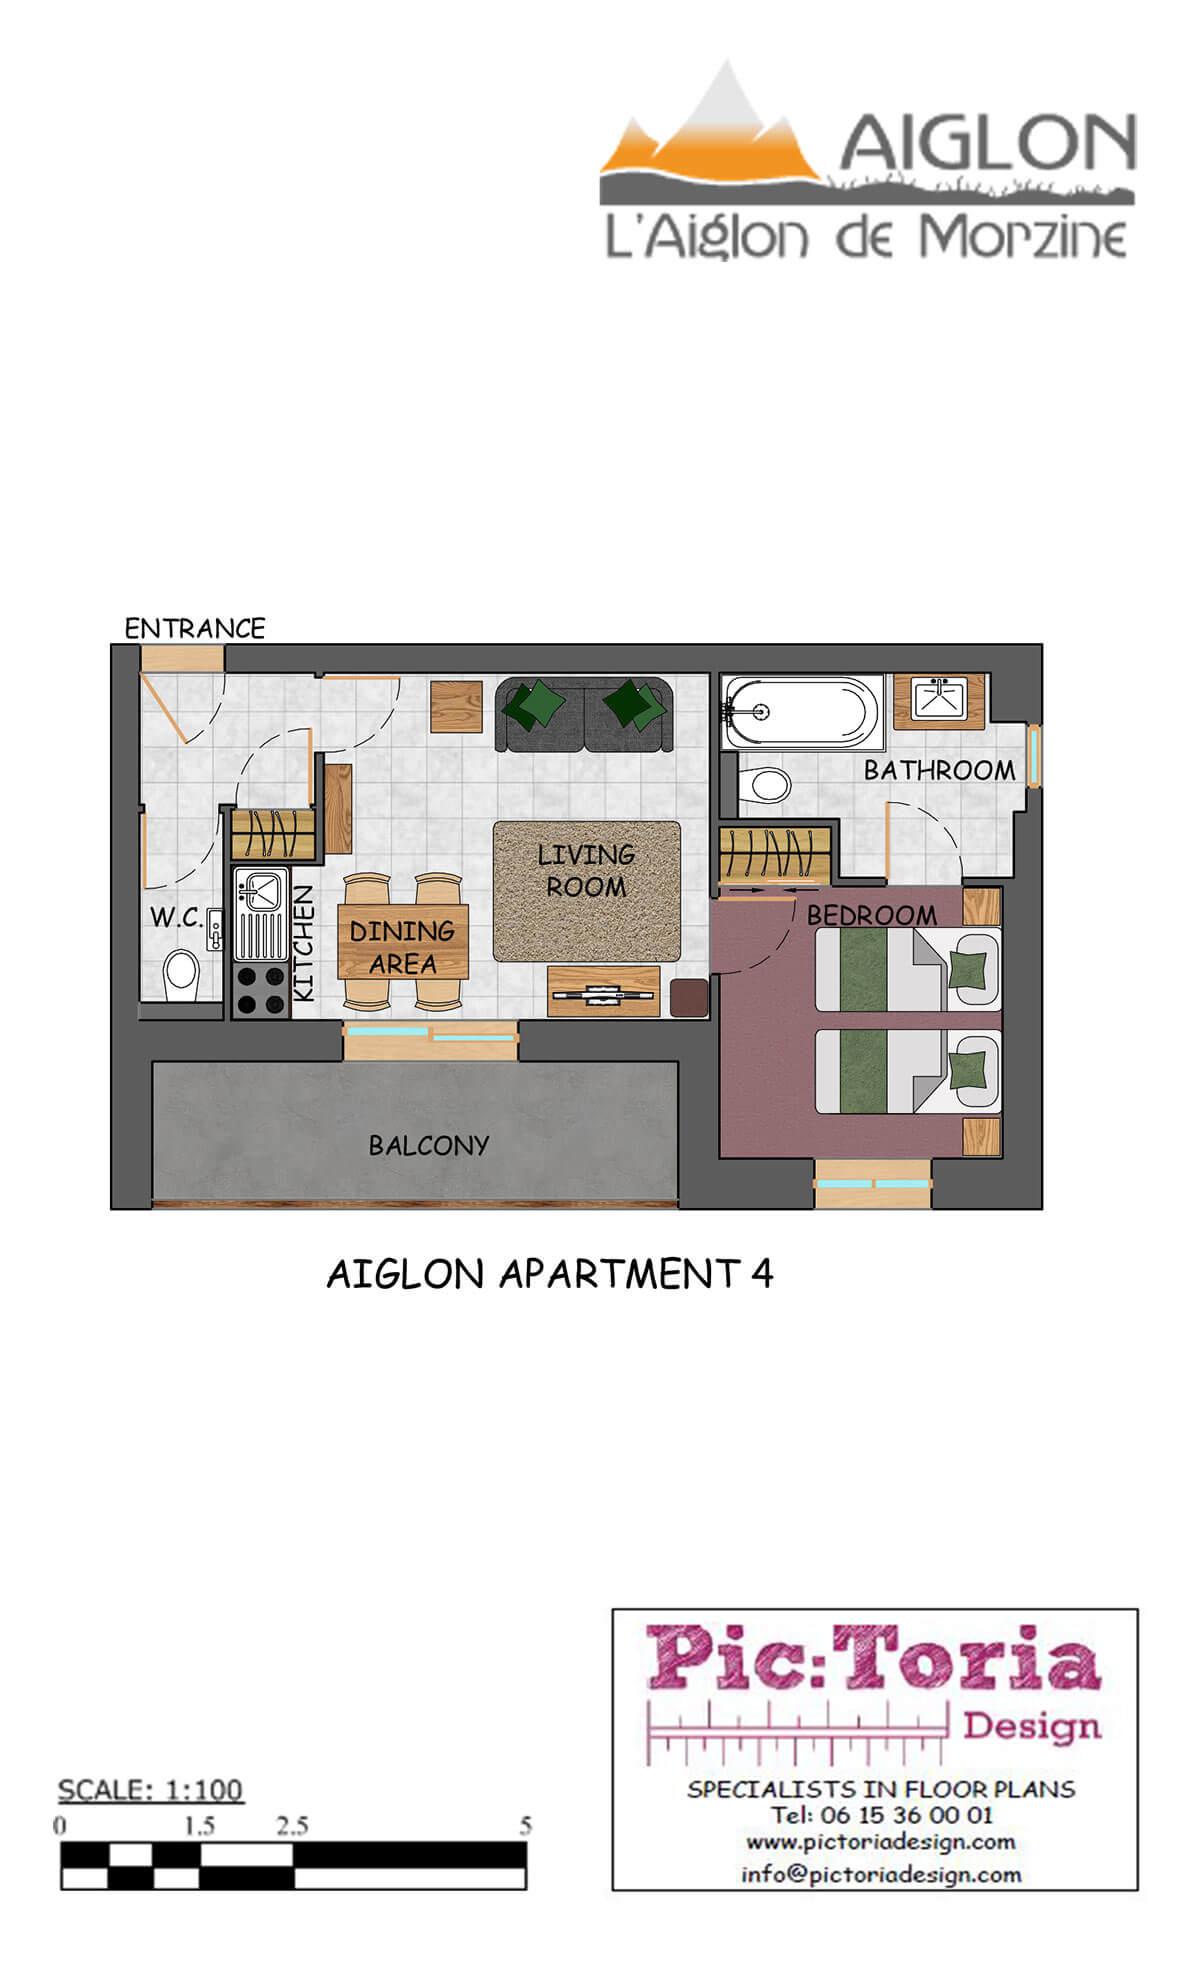 Image of Aiglon Morzine apartment floor 4 plan